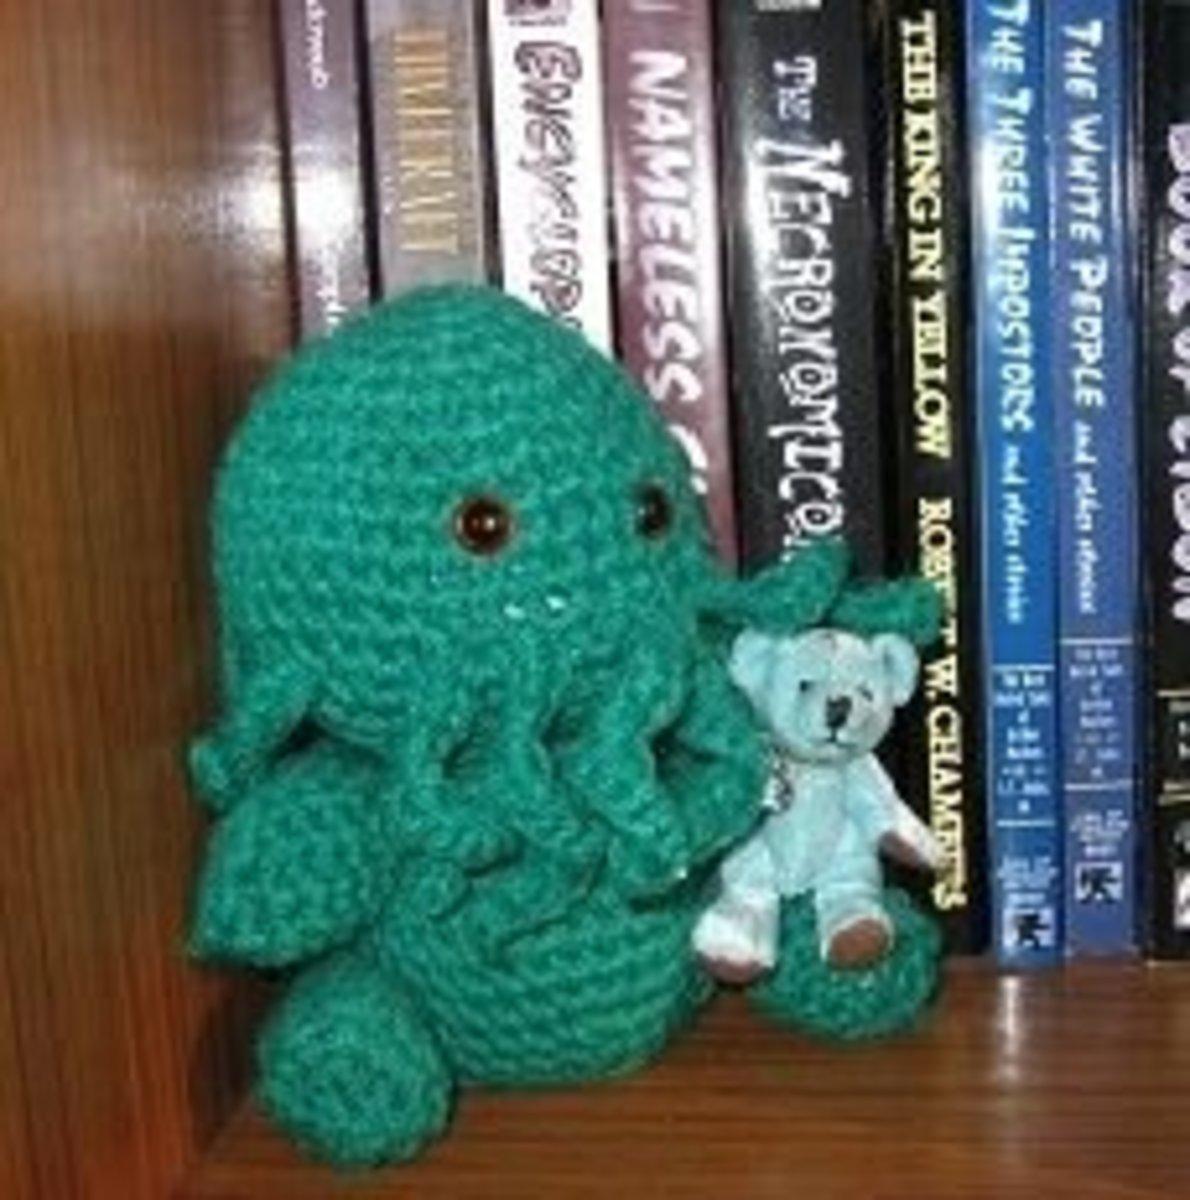 Cthulhu needs hugs too!